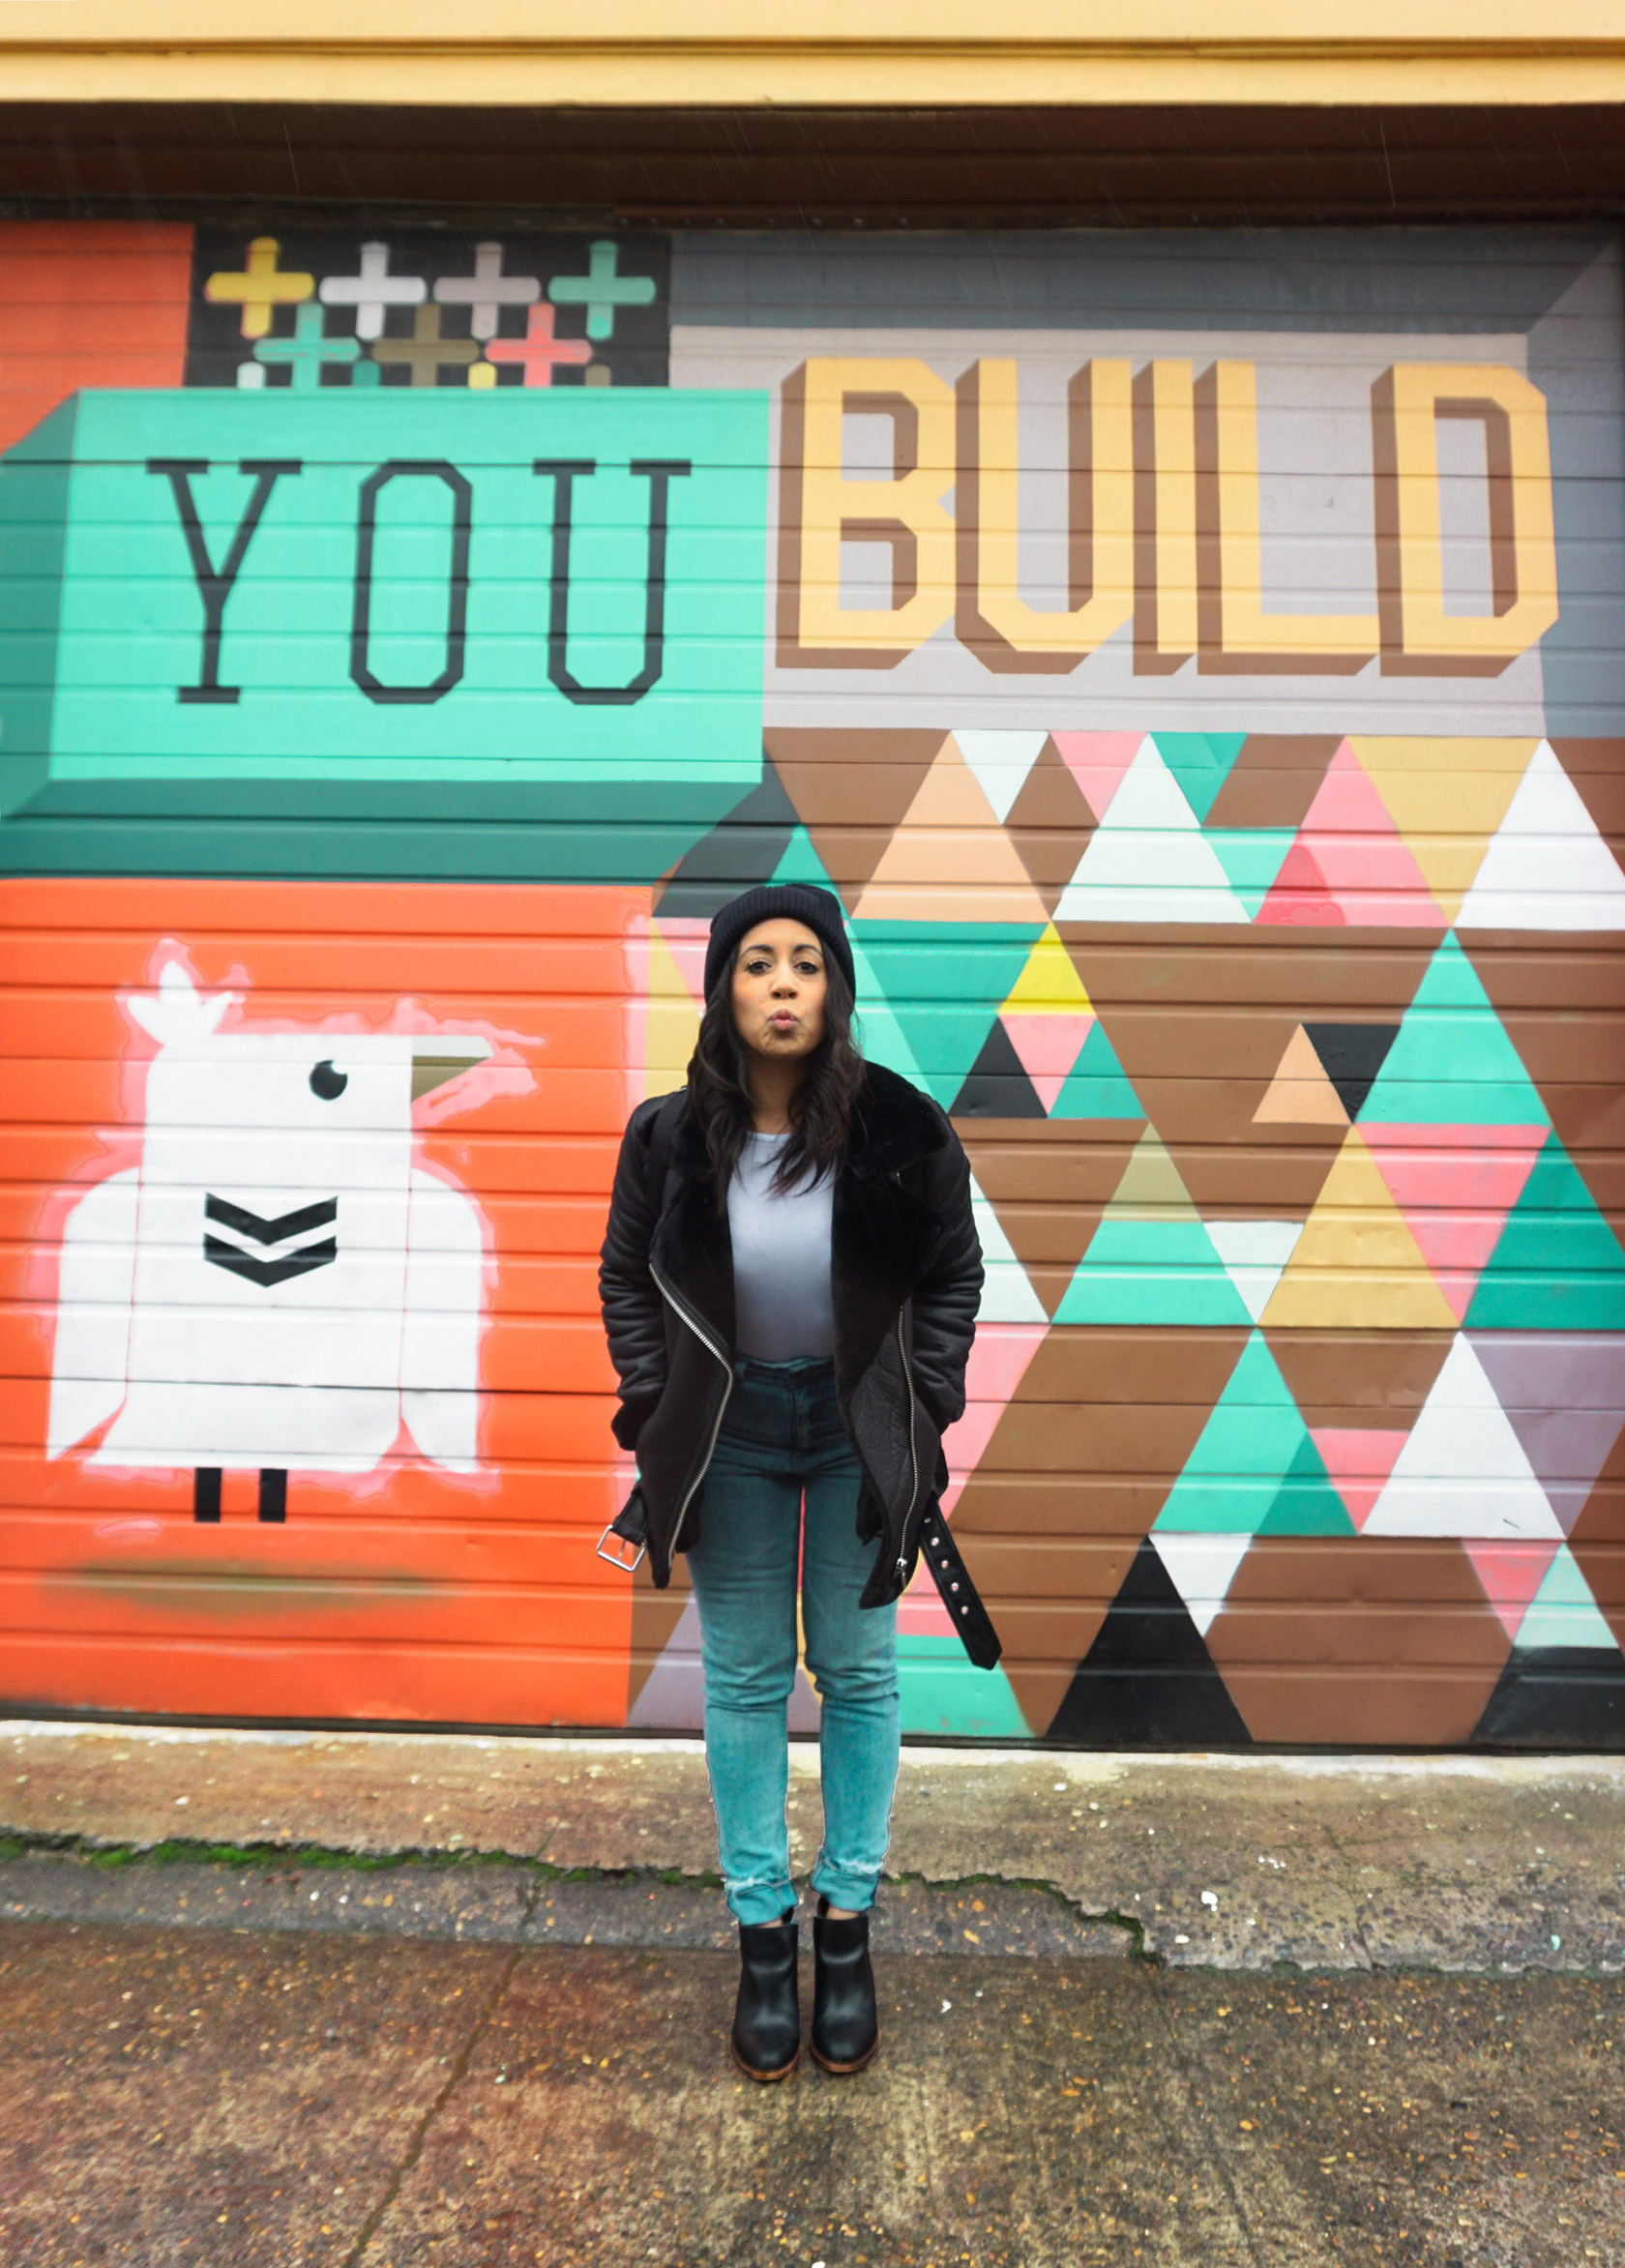 To Oregon With Love mural in NE Portland by Blaine Fontana